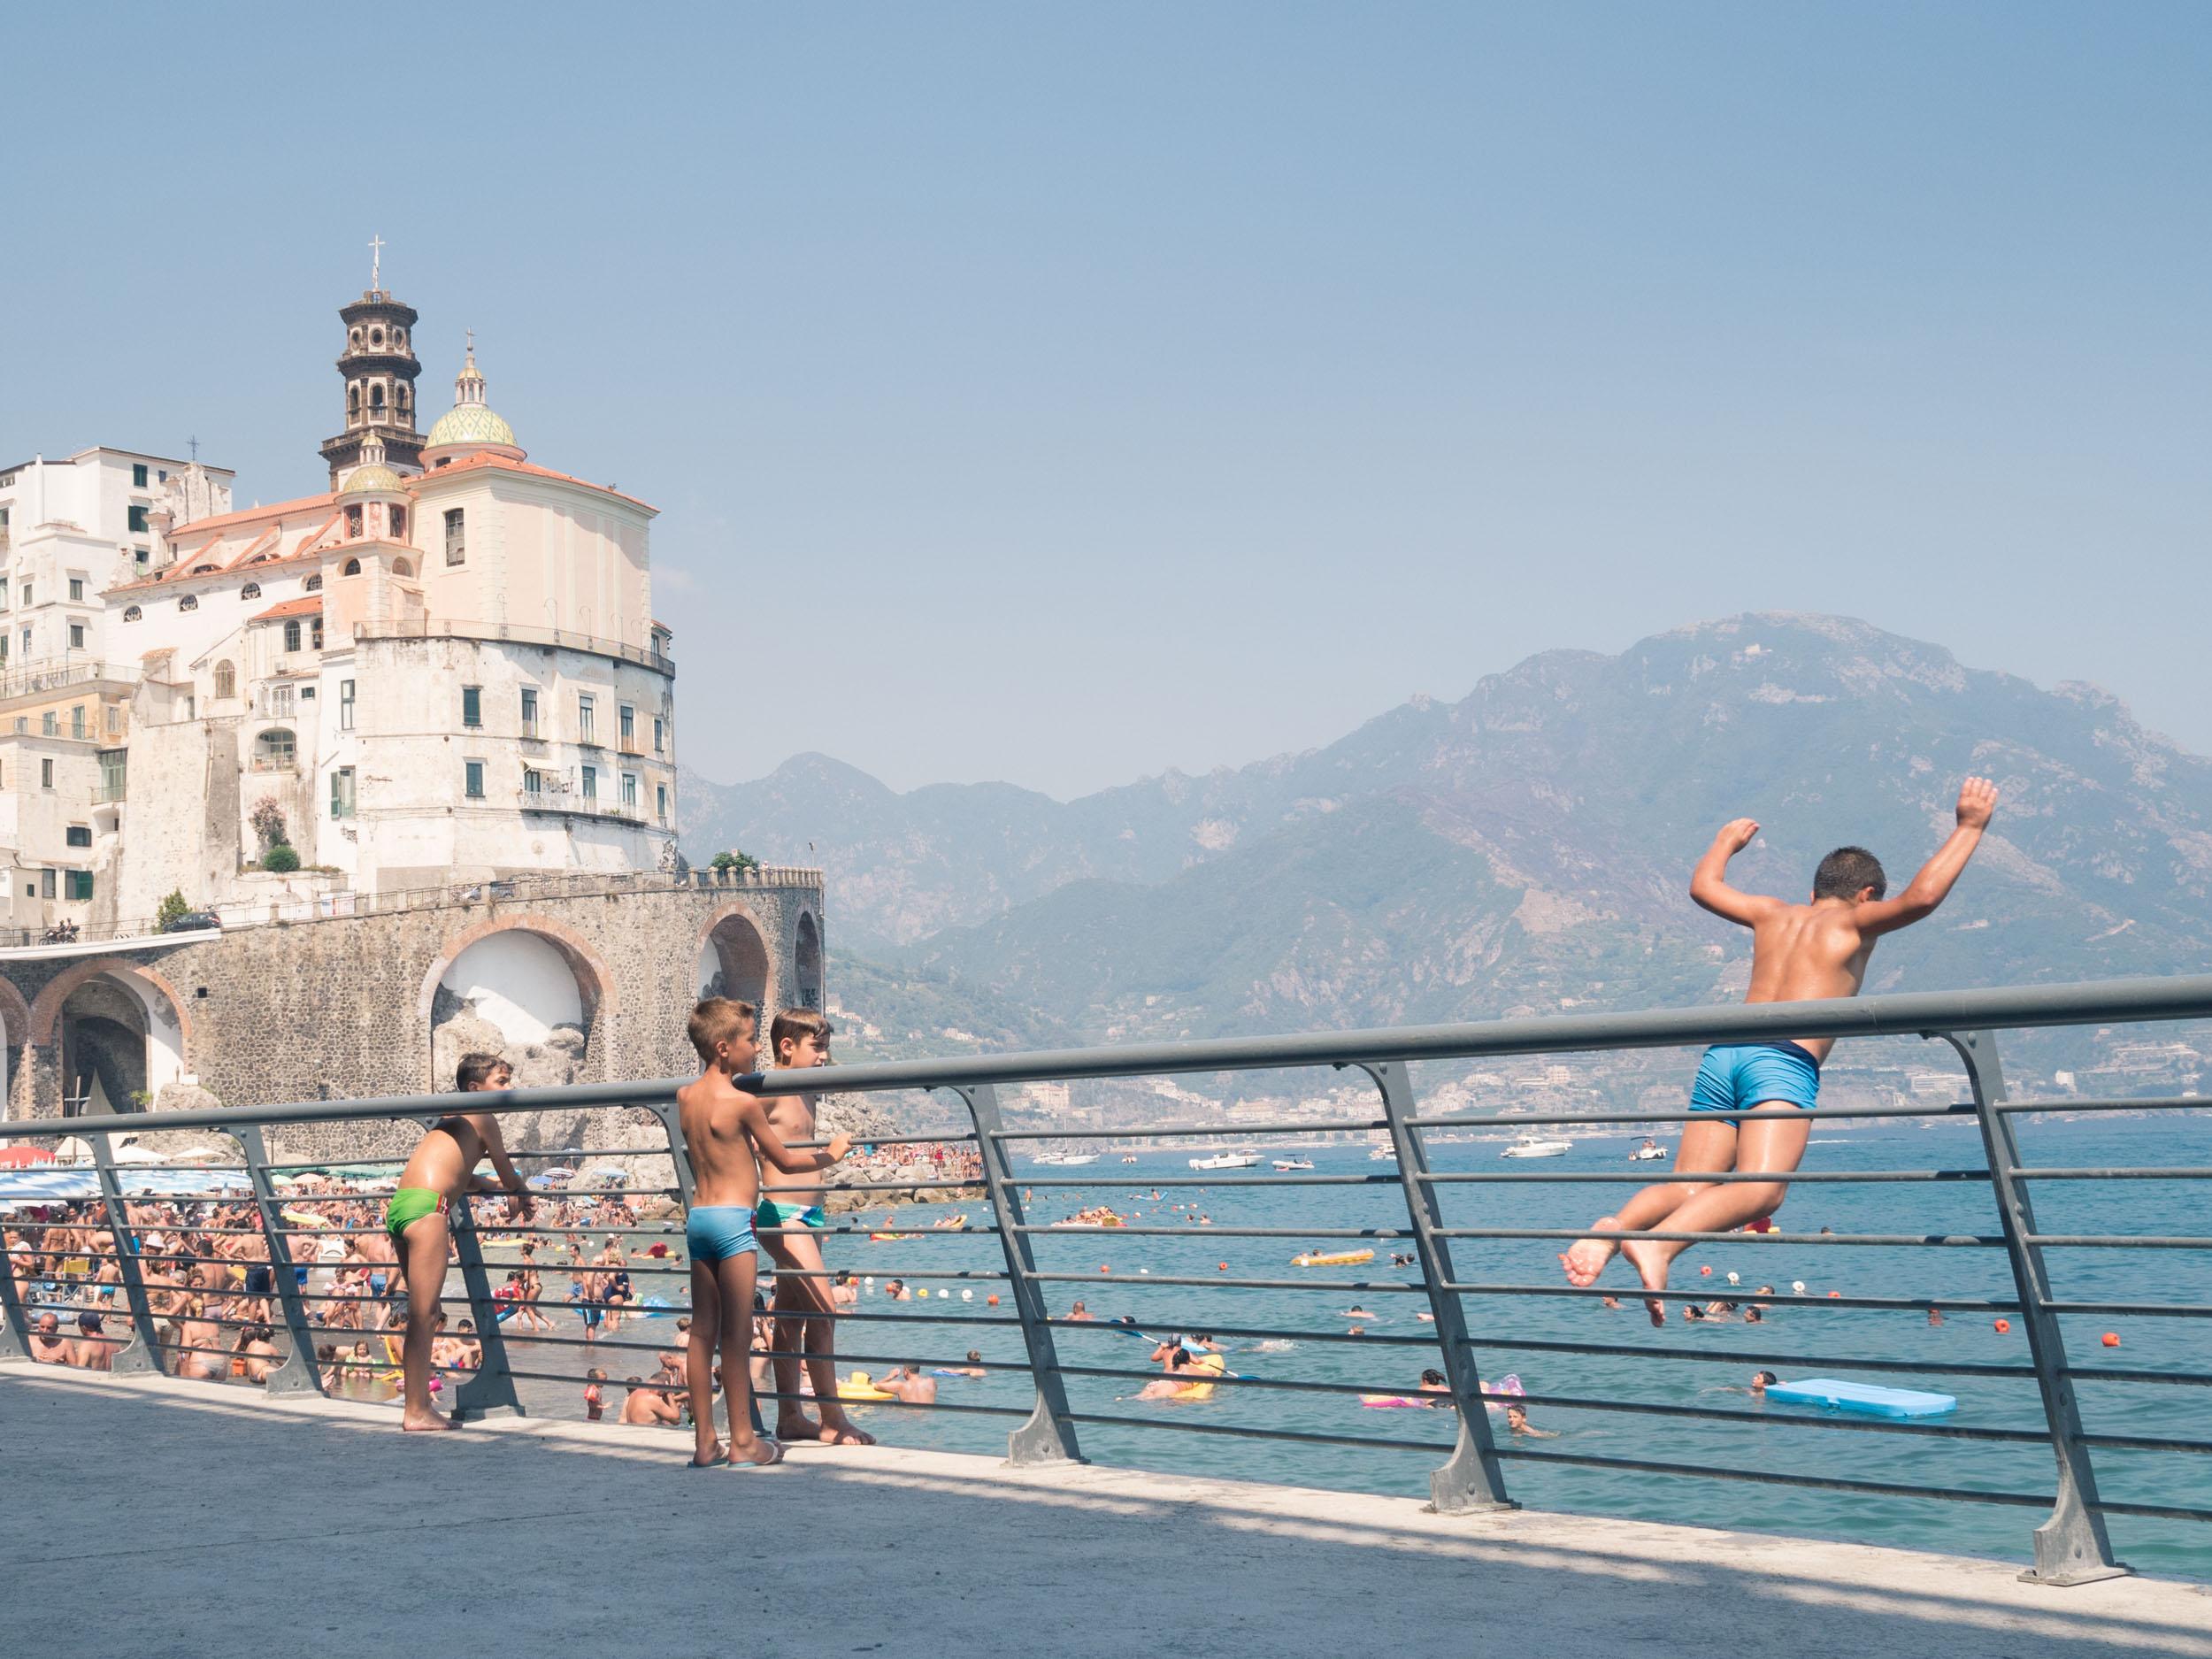 Kids playing in the city of Atrani, Amalfi Coast, Italy.